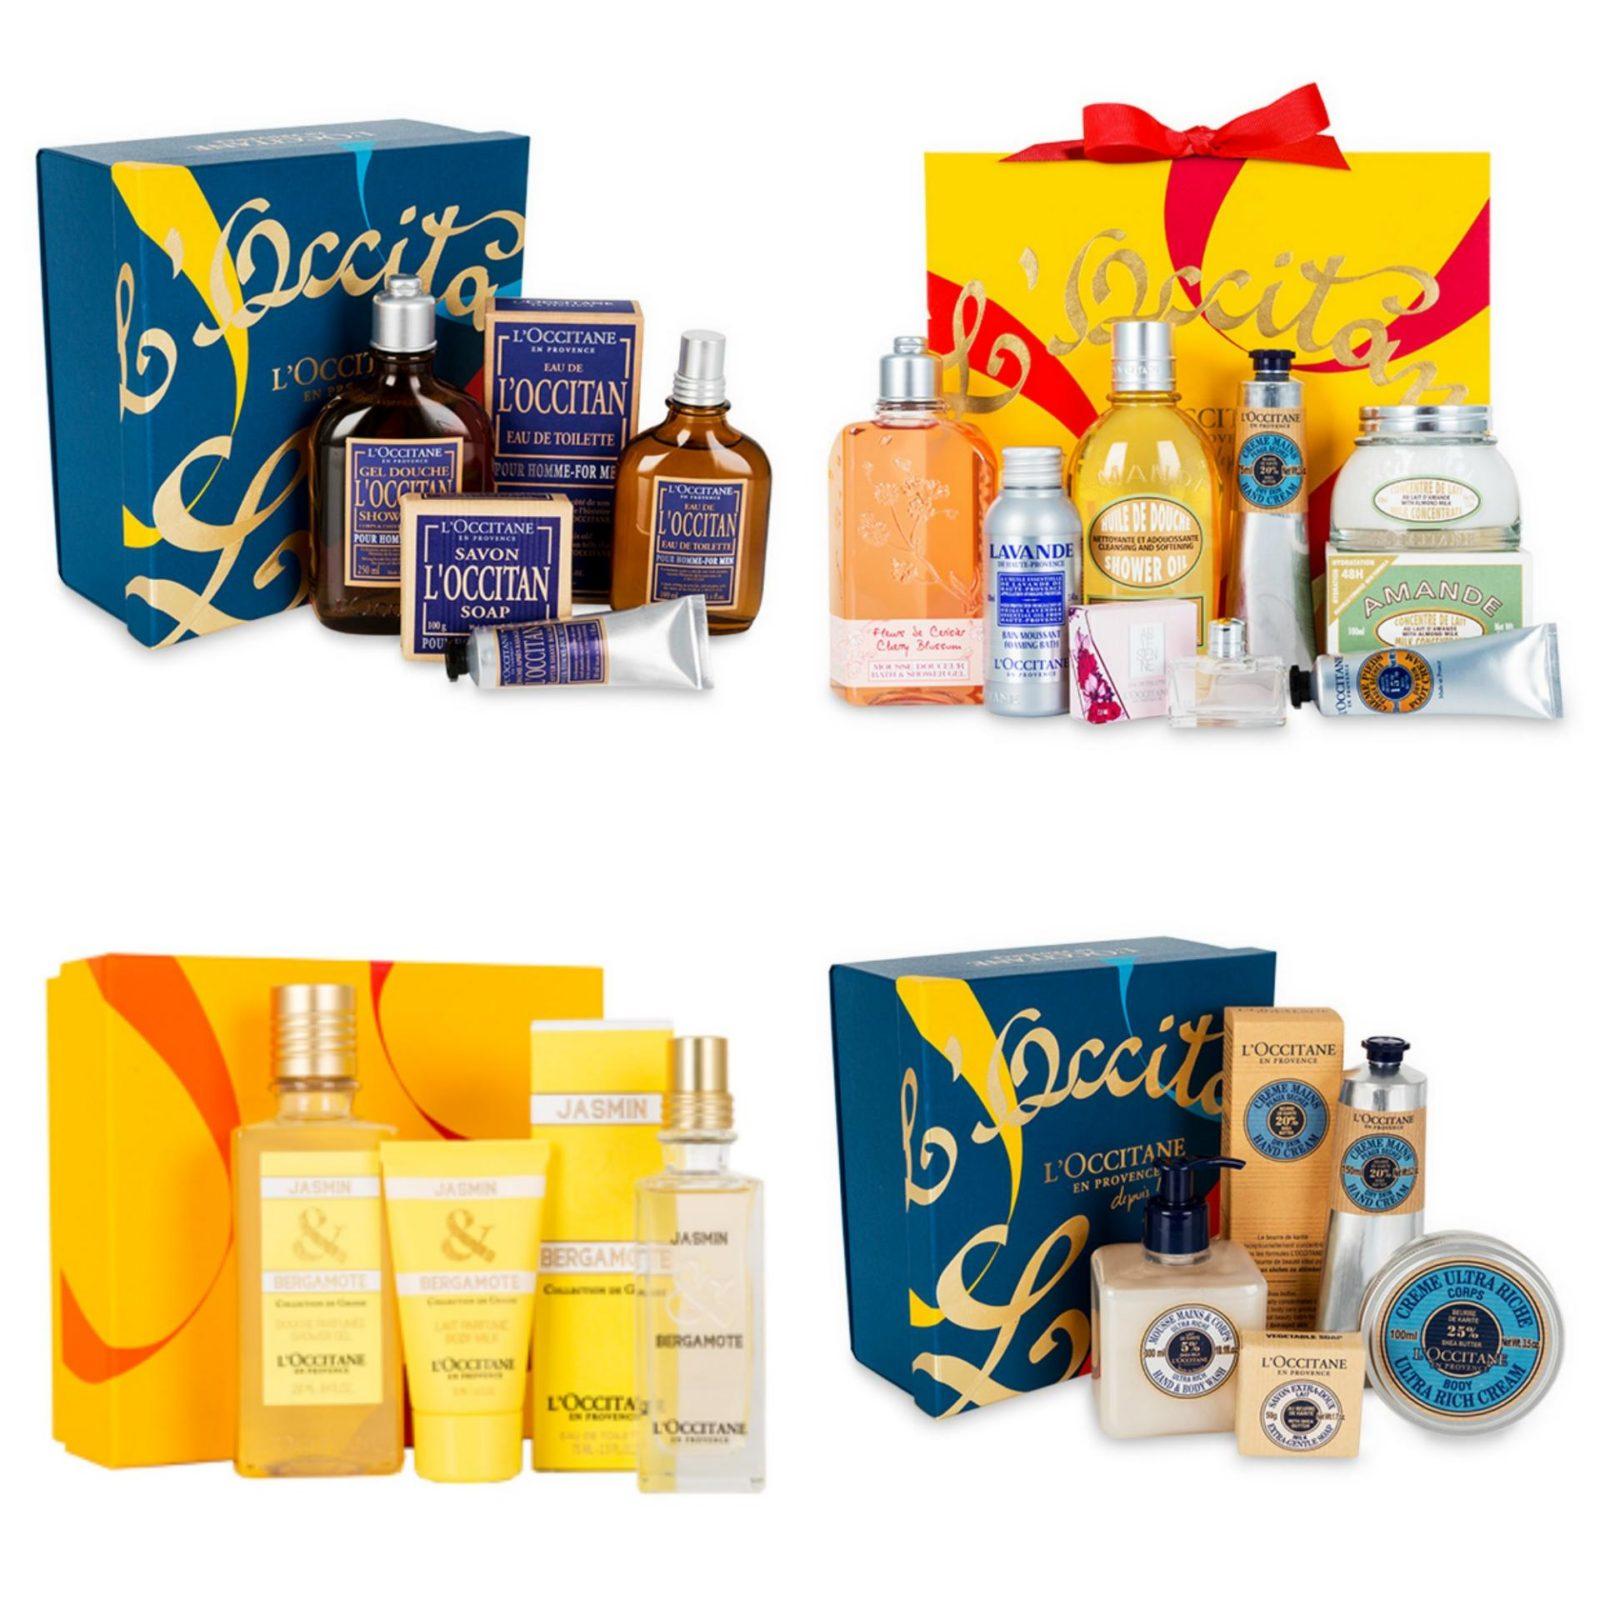 loccitane-big-gifts